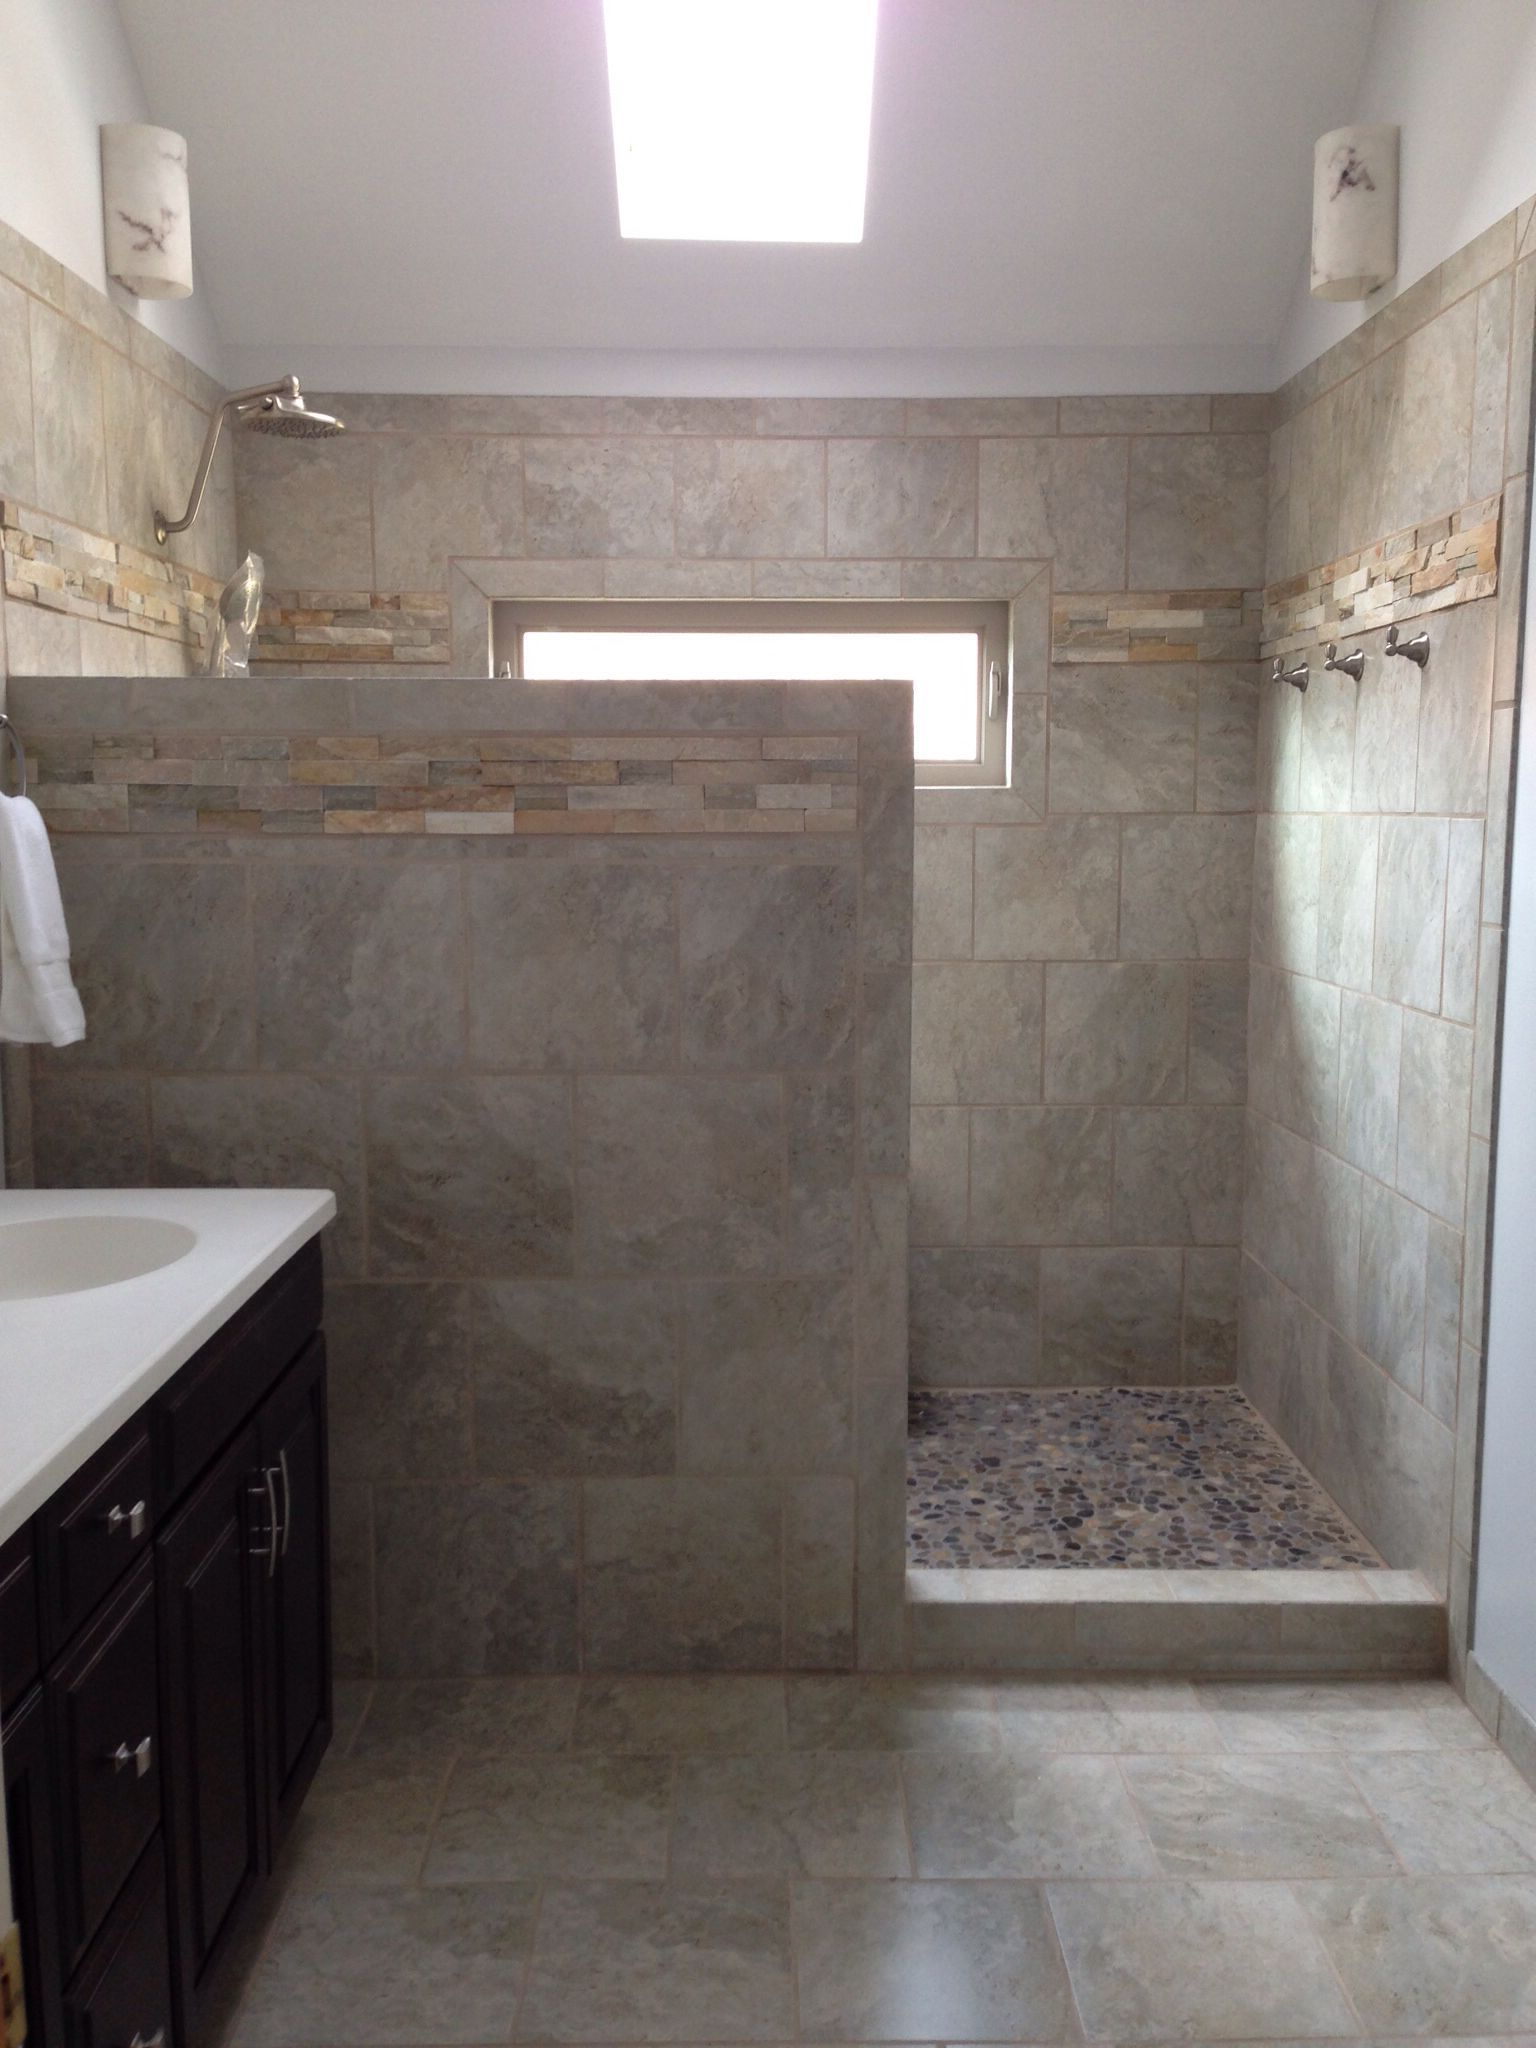 Open Shower Ideas Awesome Doorless Shower Creativity Decor Around The World Shower Remodel Bathroom Remodel Shower Bathrooms Remodel